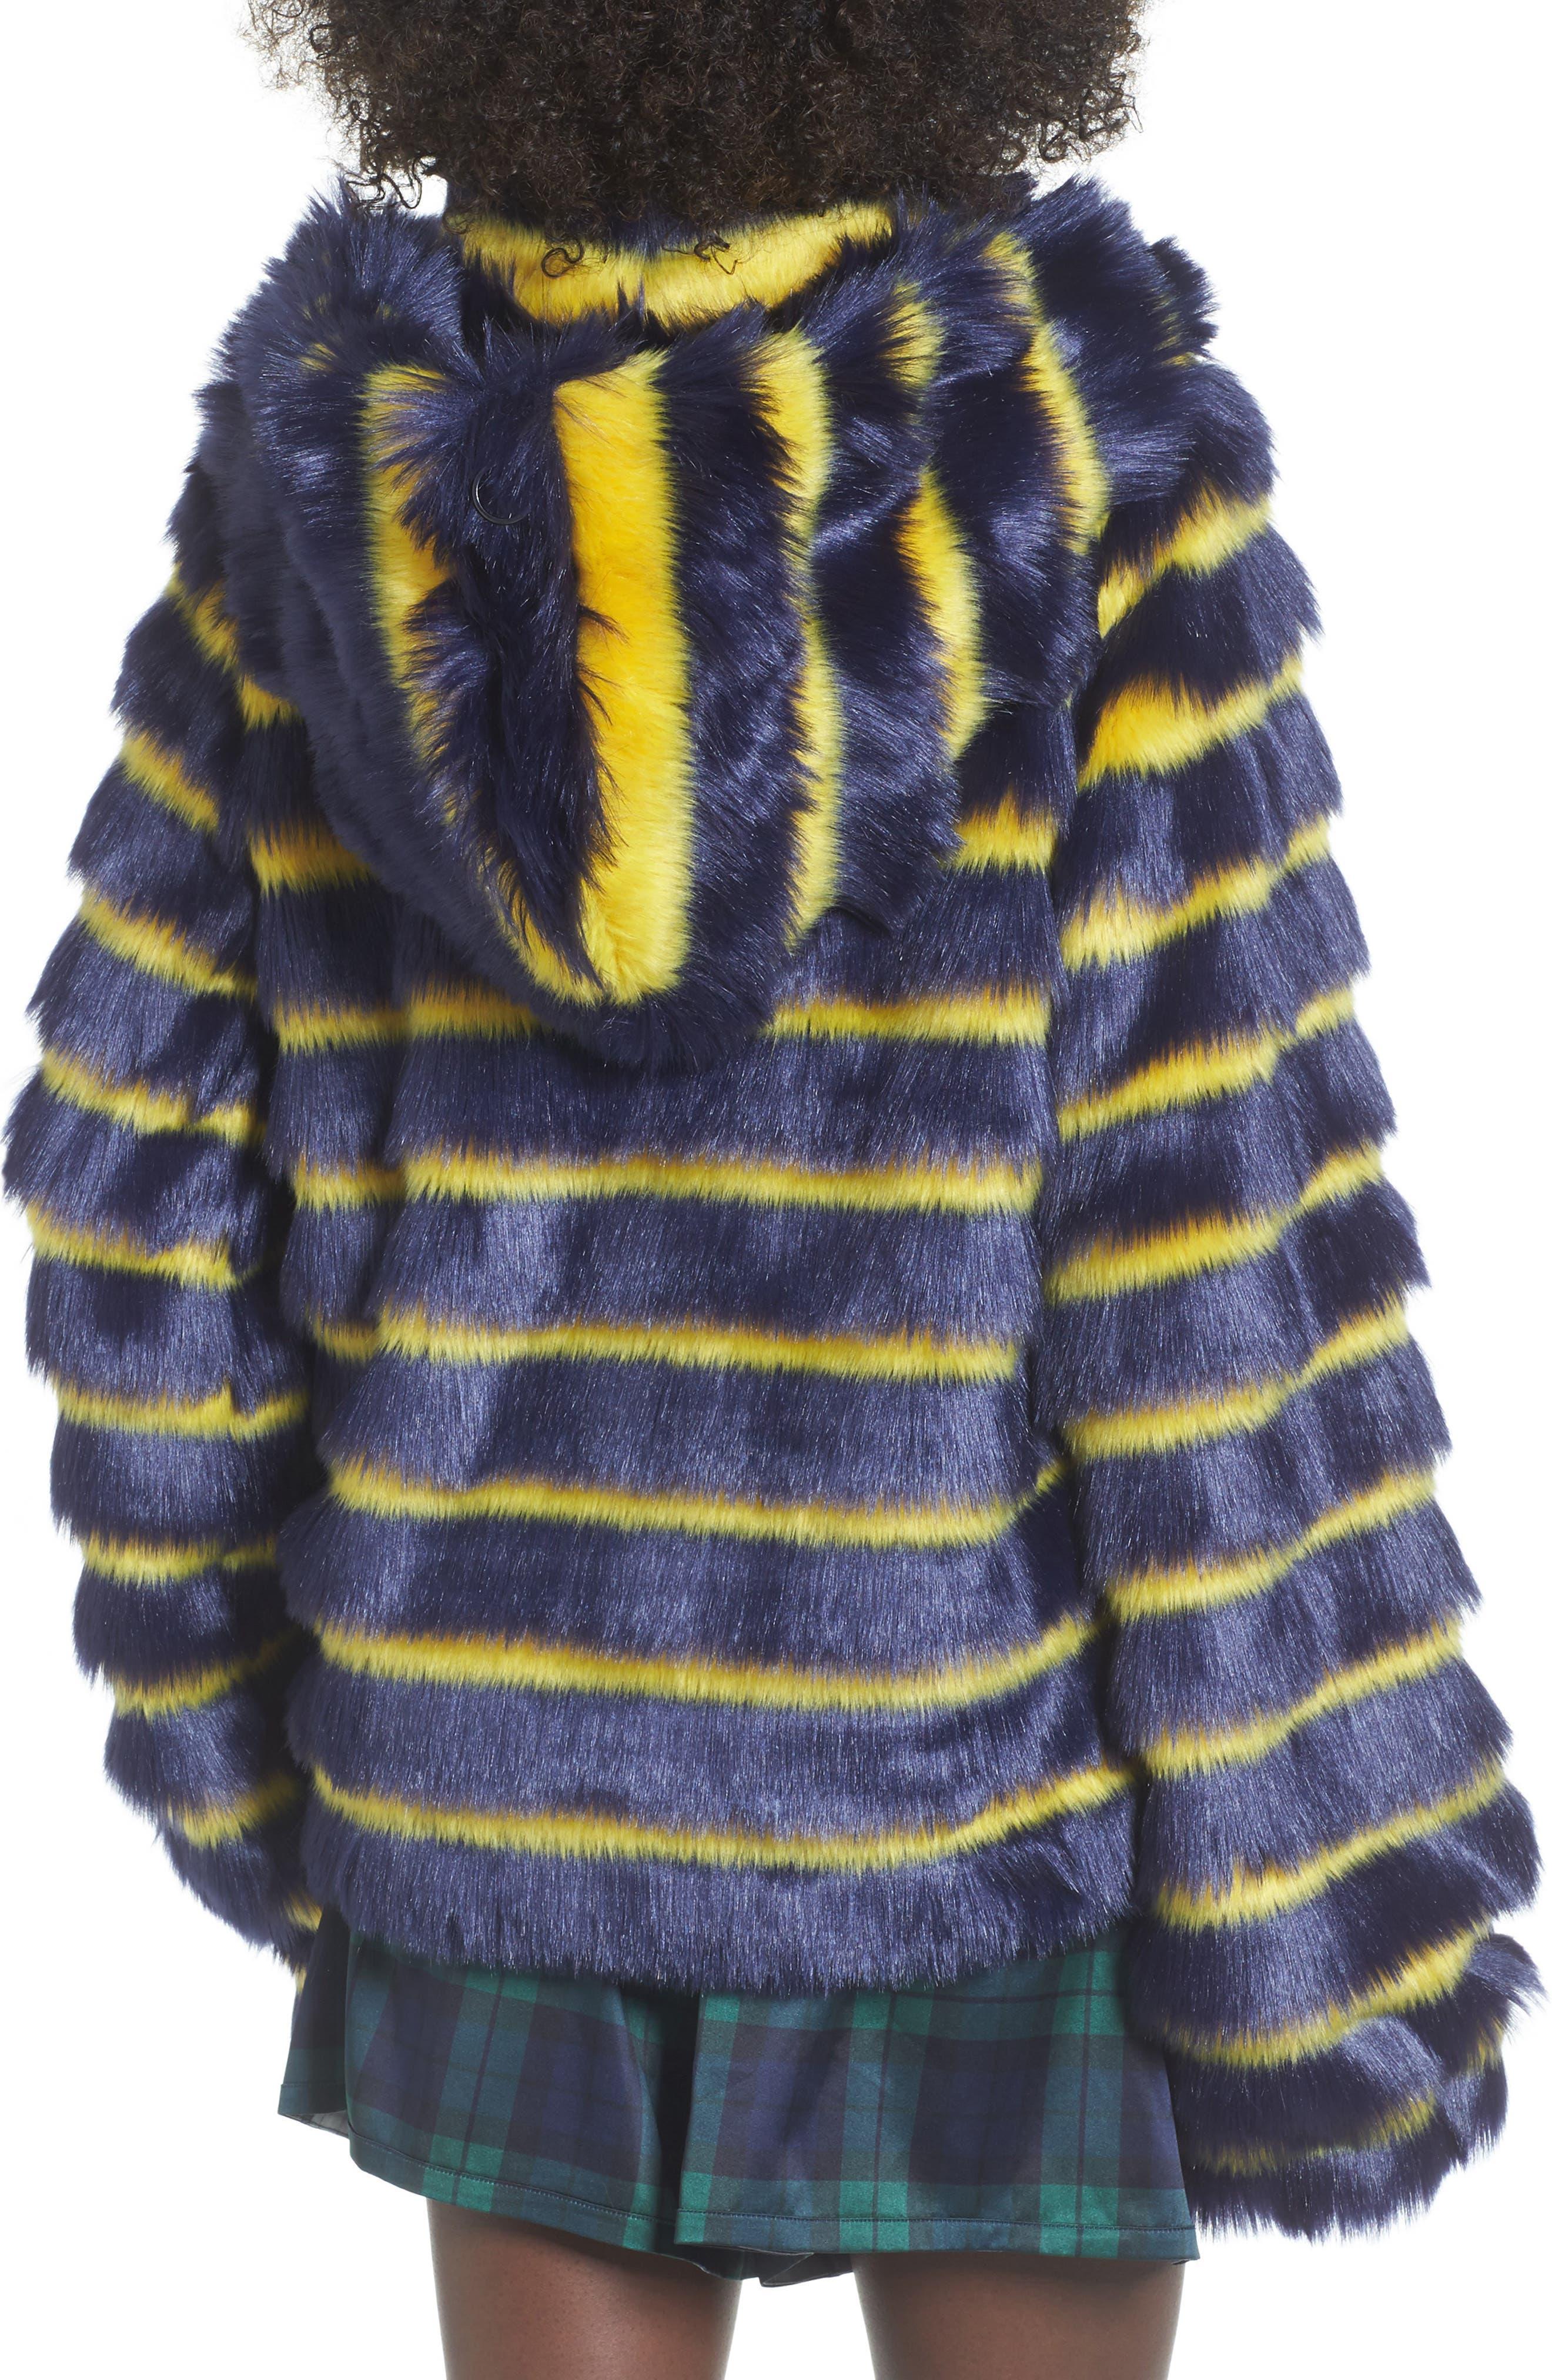 PUMA by Rihanna Faux Shearling Hooded Jacket,                             Alternate thumbnail 2, color,                             400